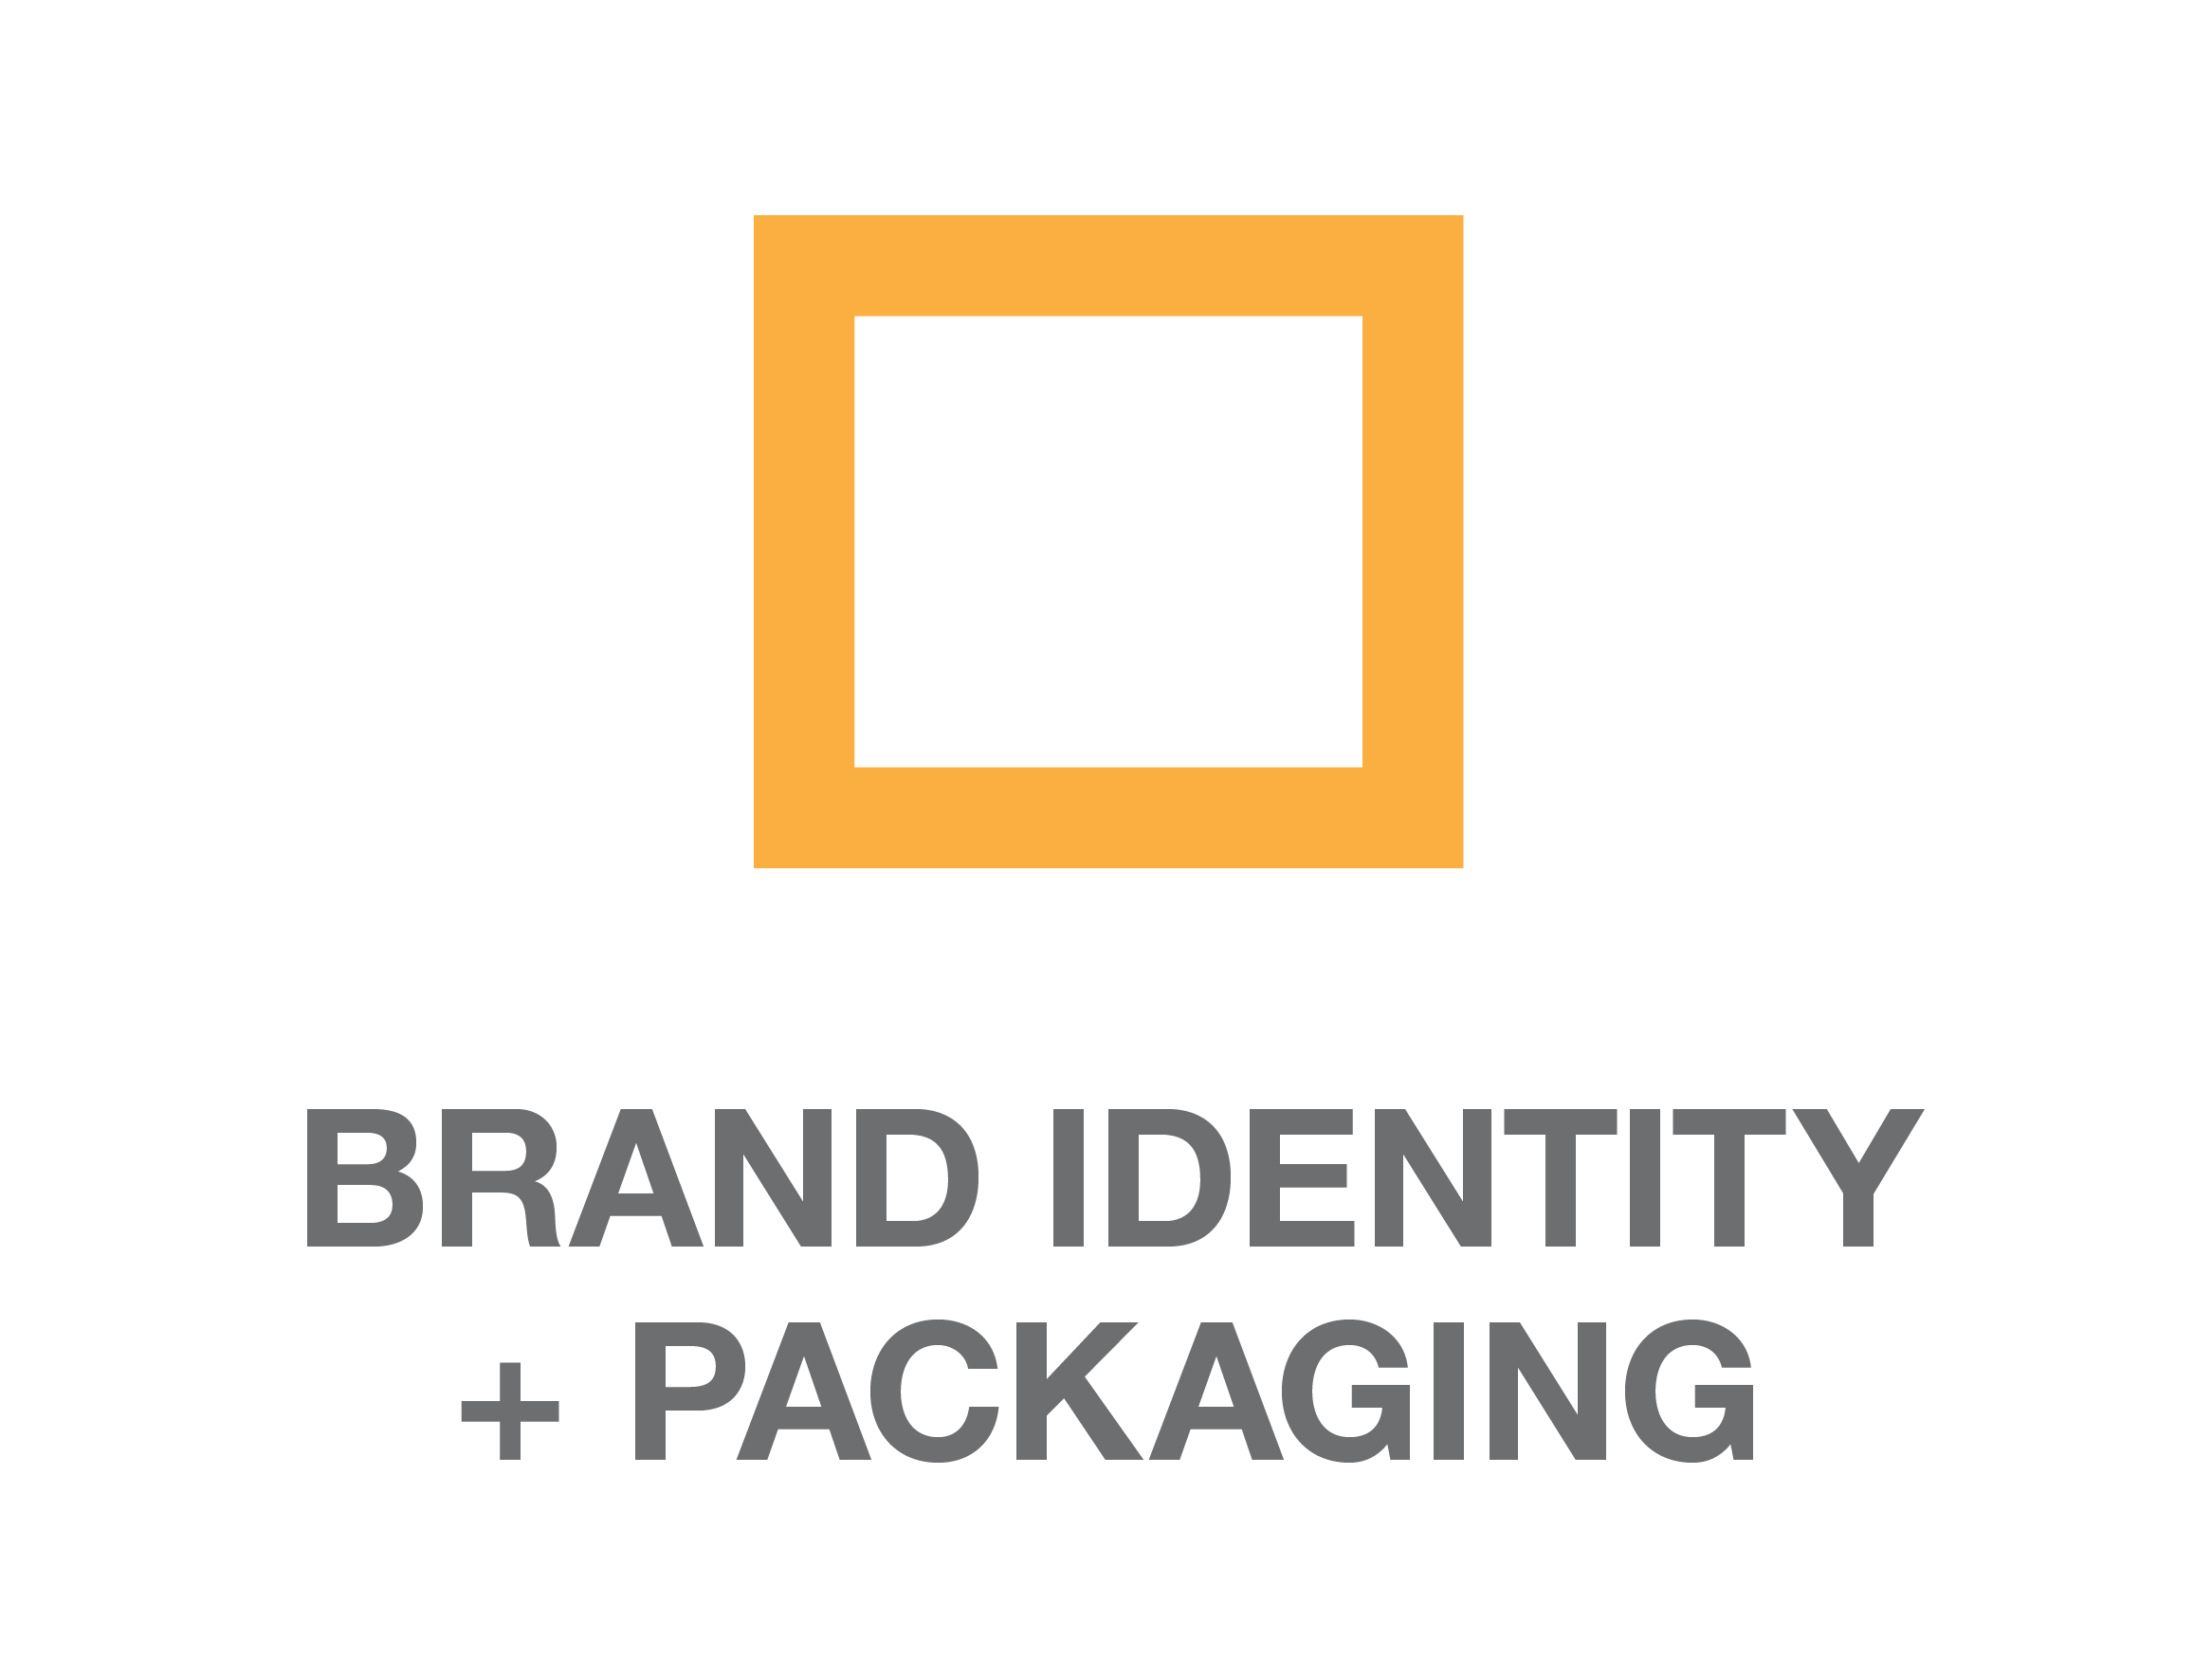 Brand Identity + Packaging